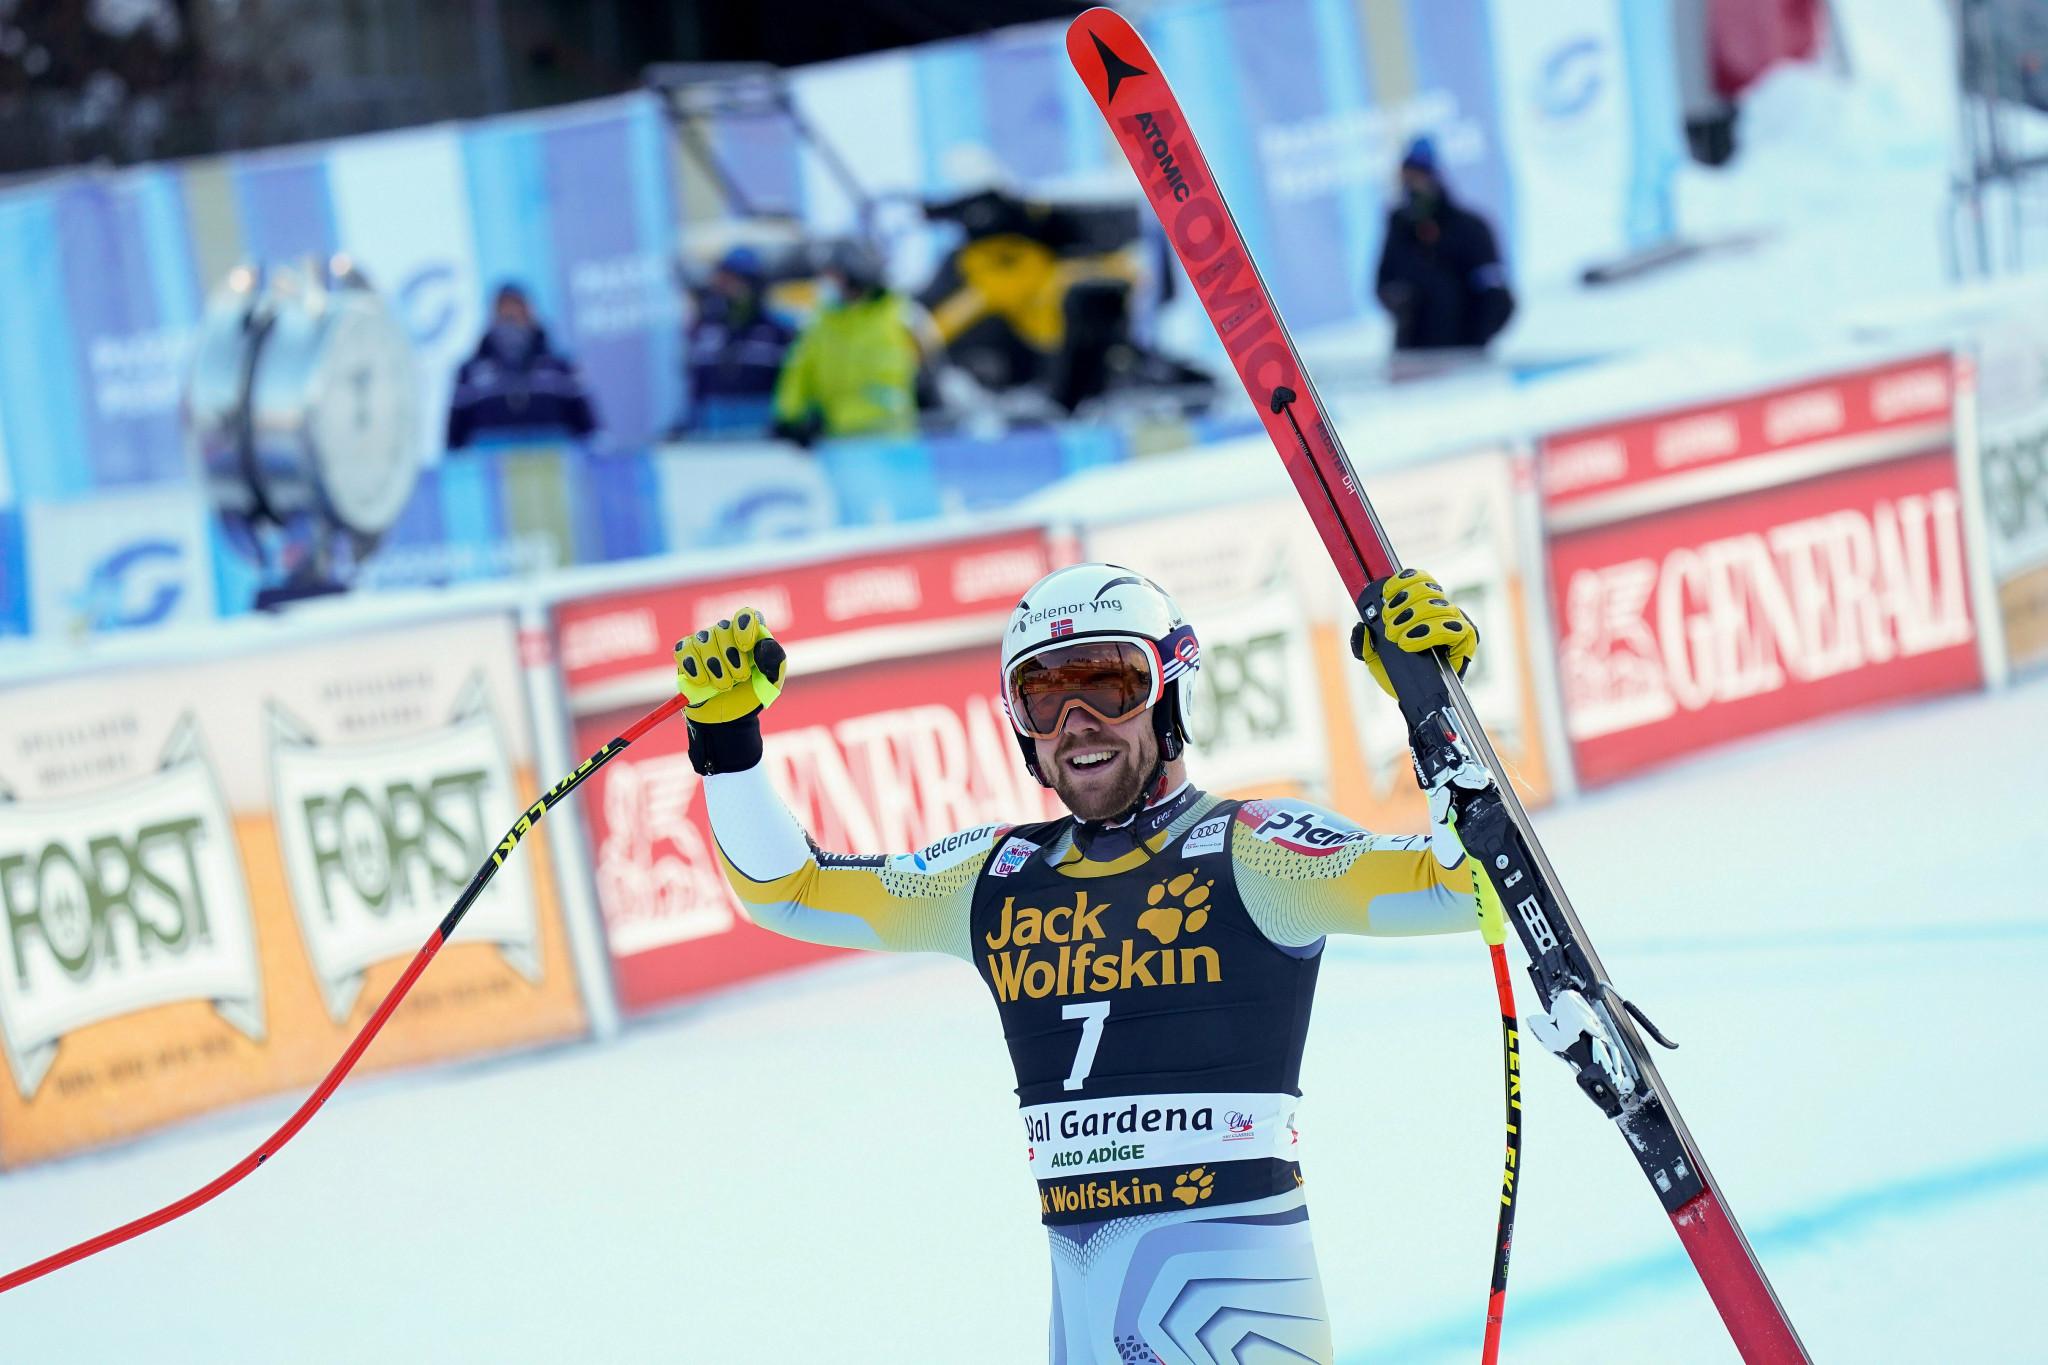 Kilde wins second consecutive FIS Alpine Ski World Cup race in Val Gardena